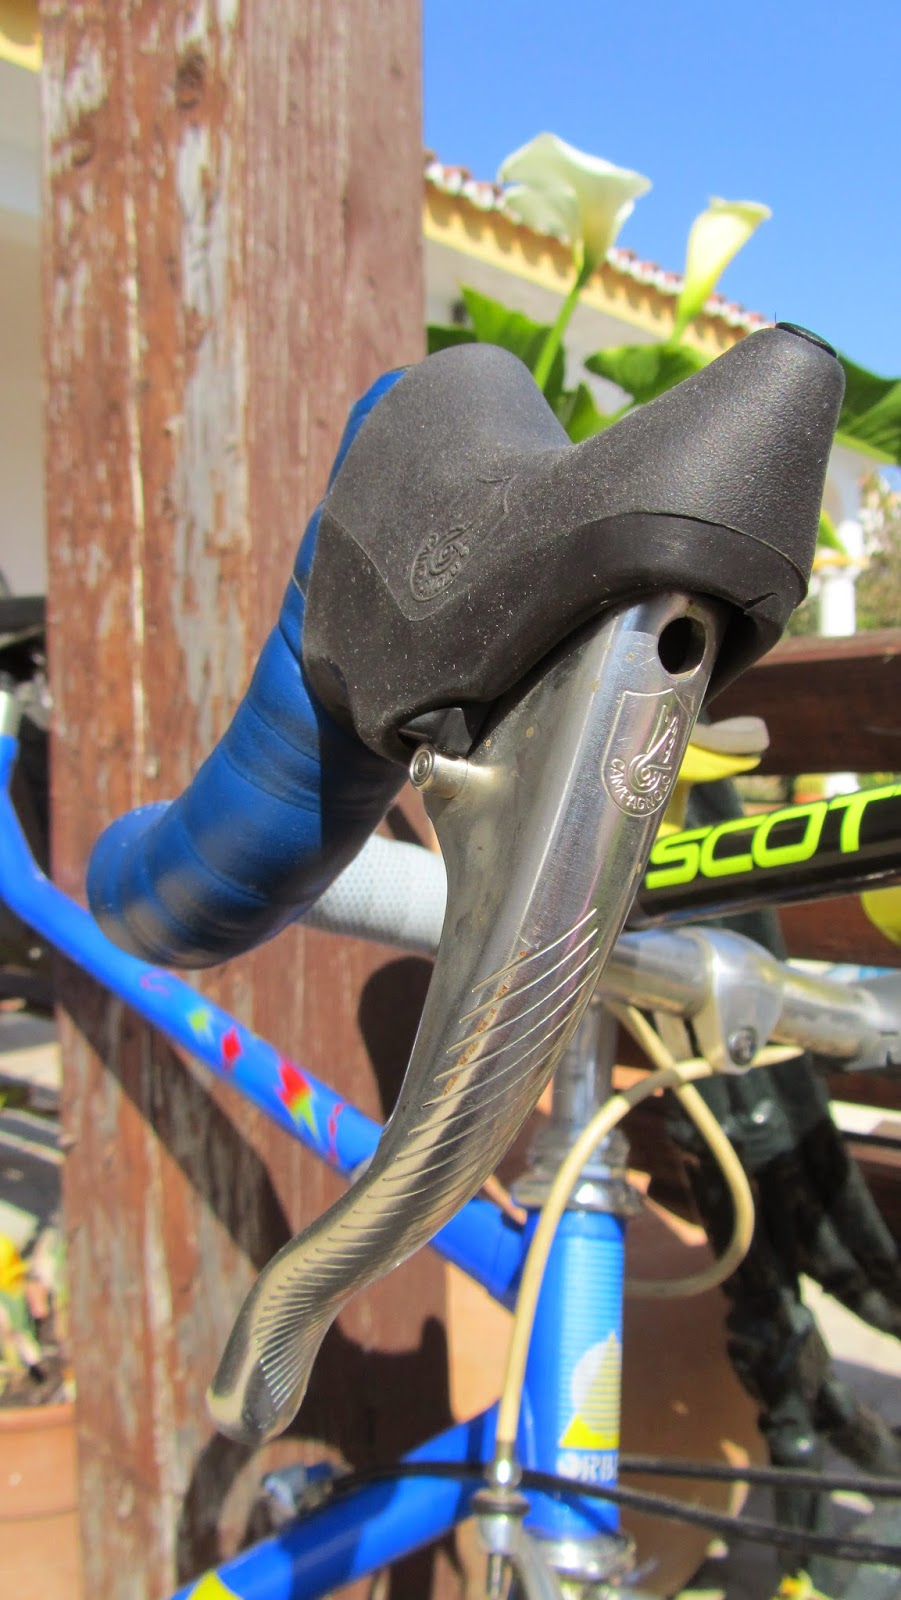 bicicleta orbea contrarreloj manetas campagnolo record